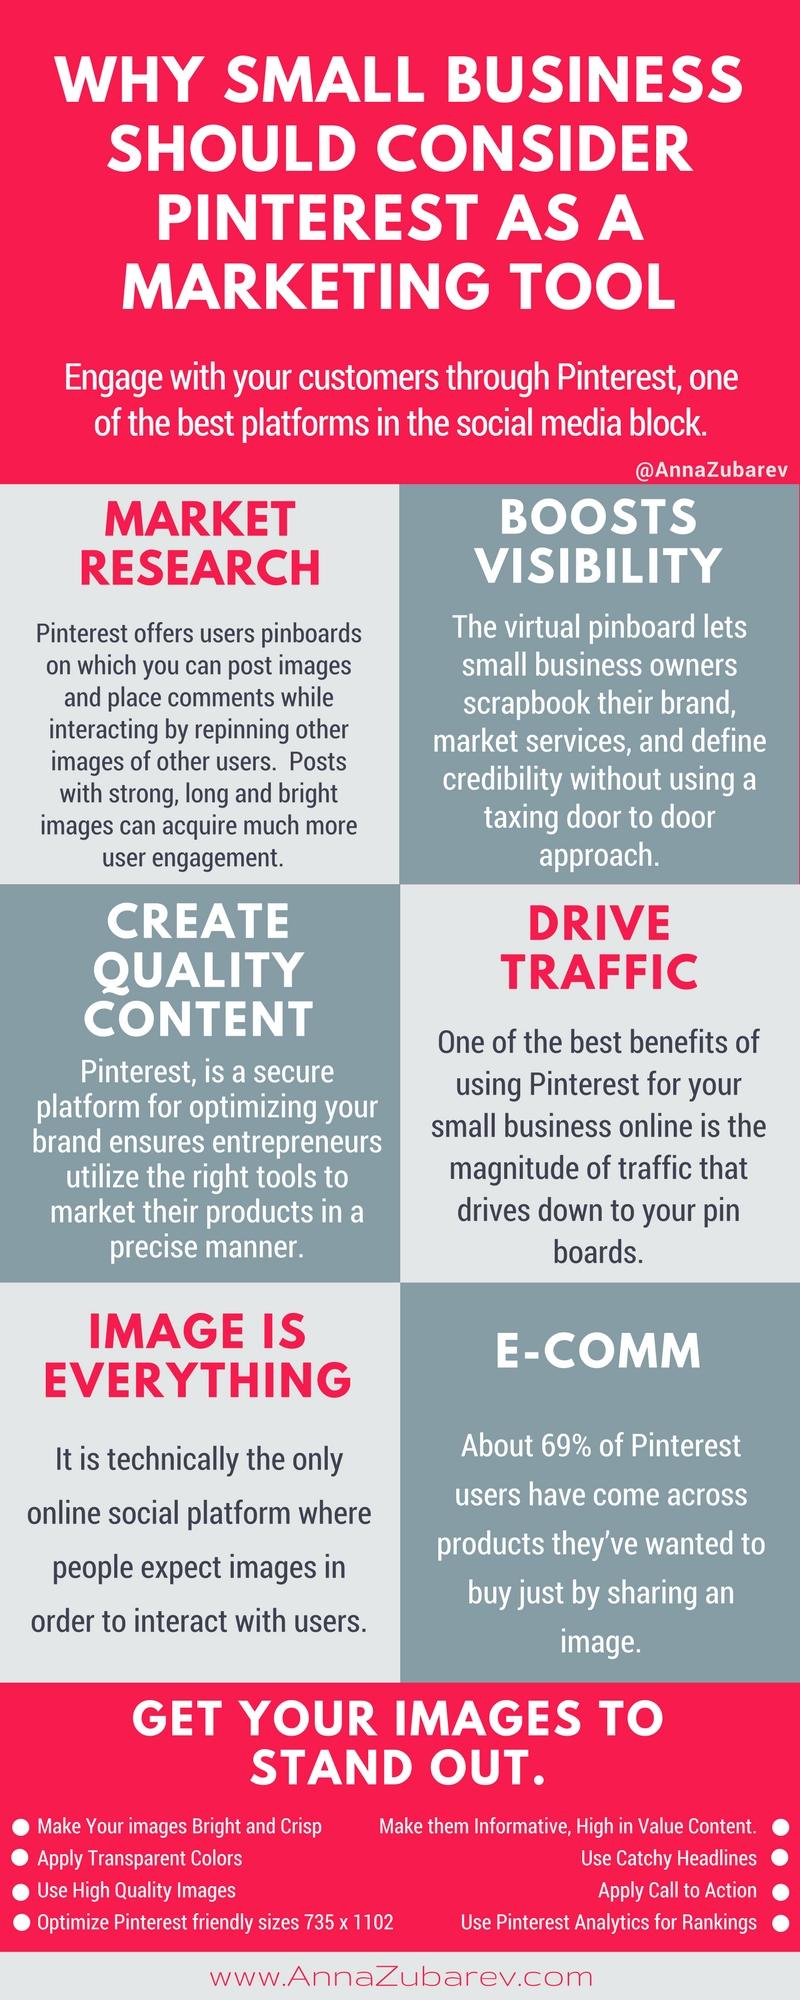 Why Small Business Should Consider Pinterest as a Marketing Tool. via @annazubarev